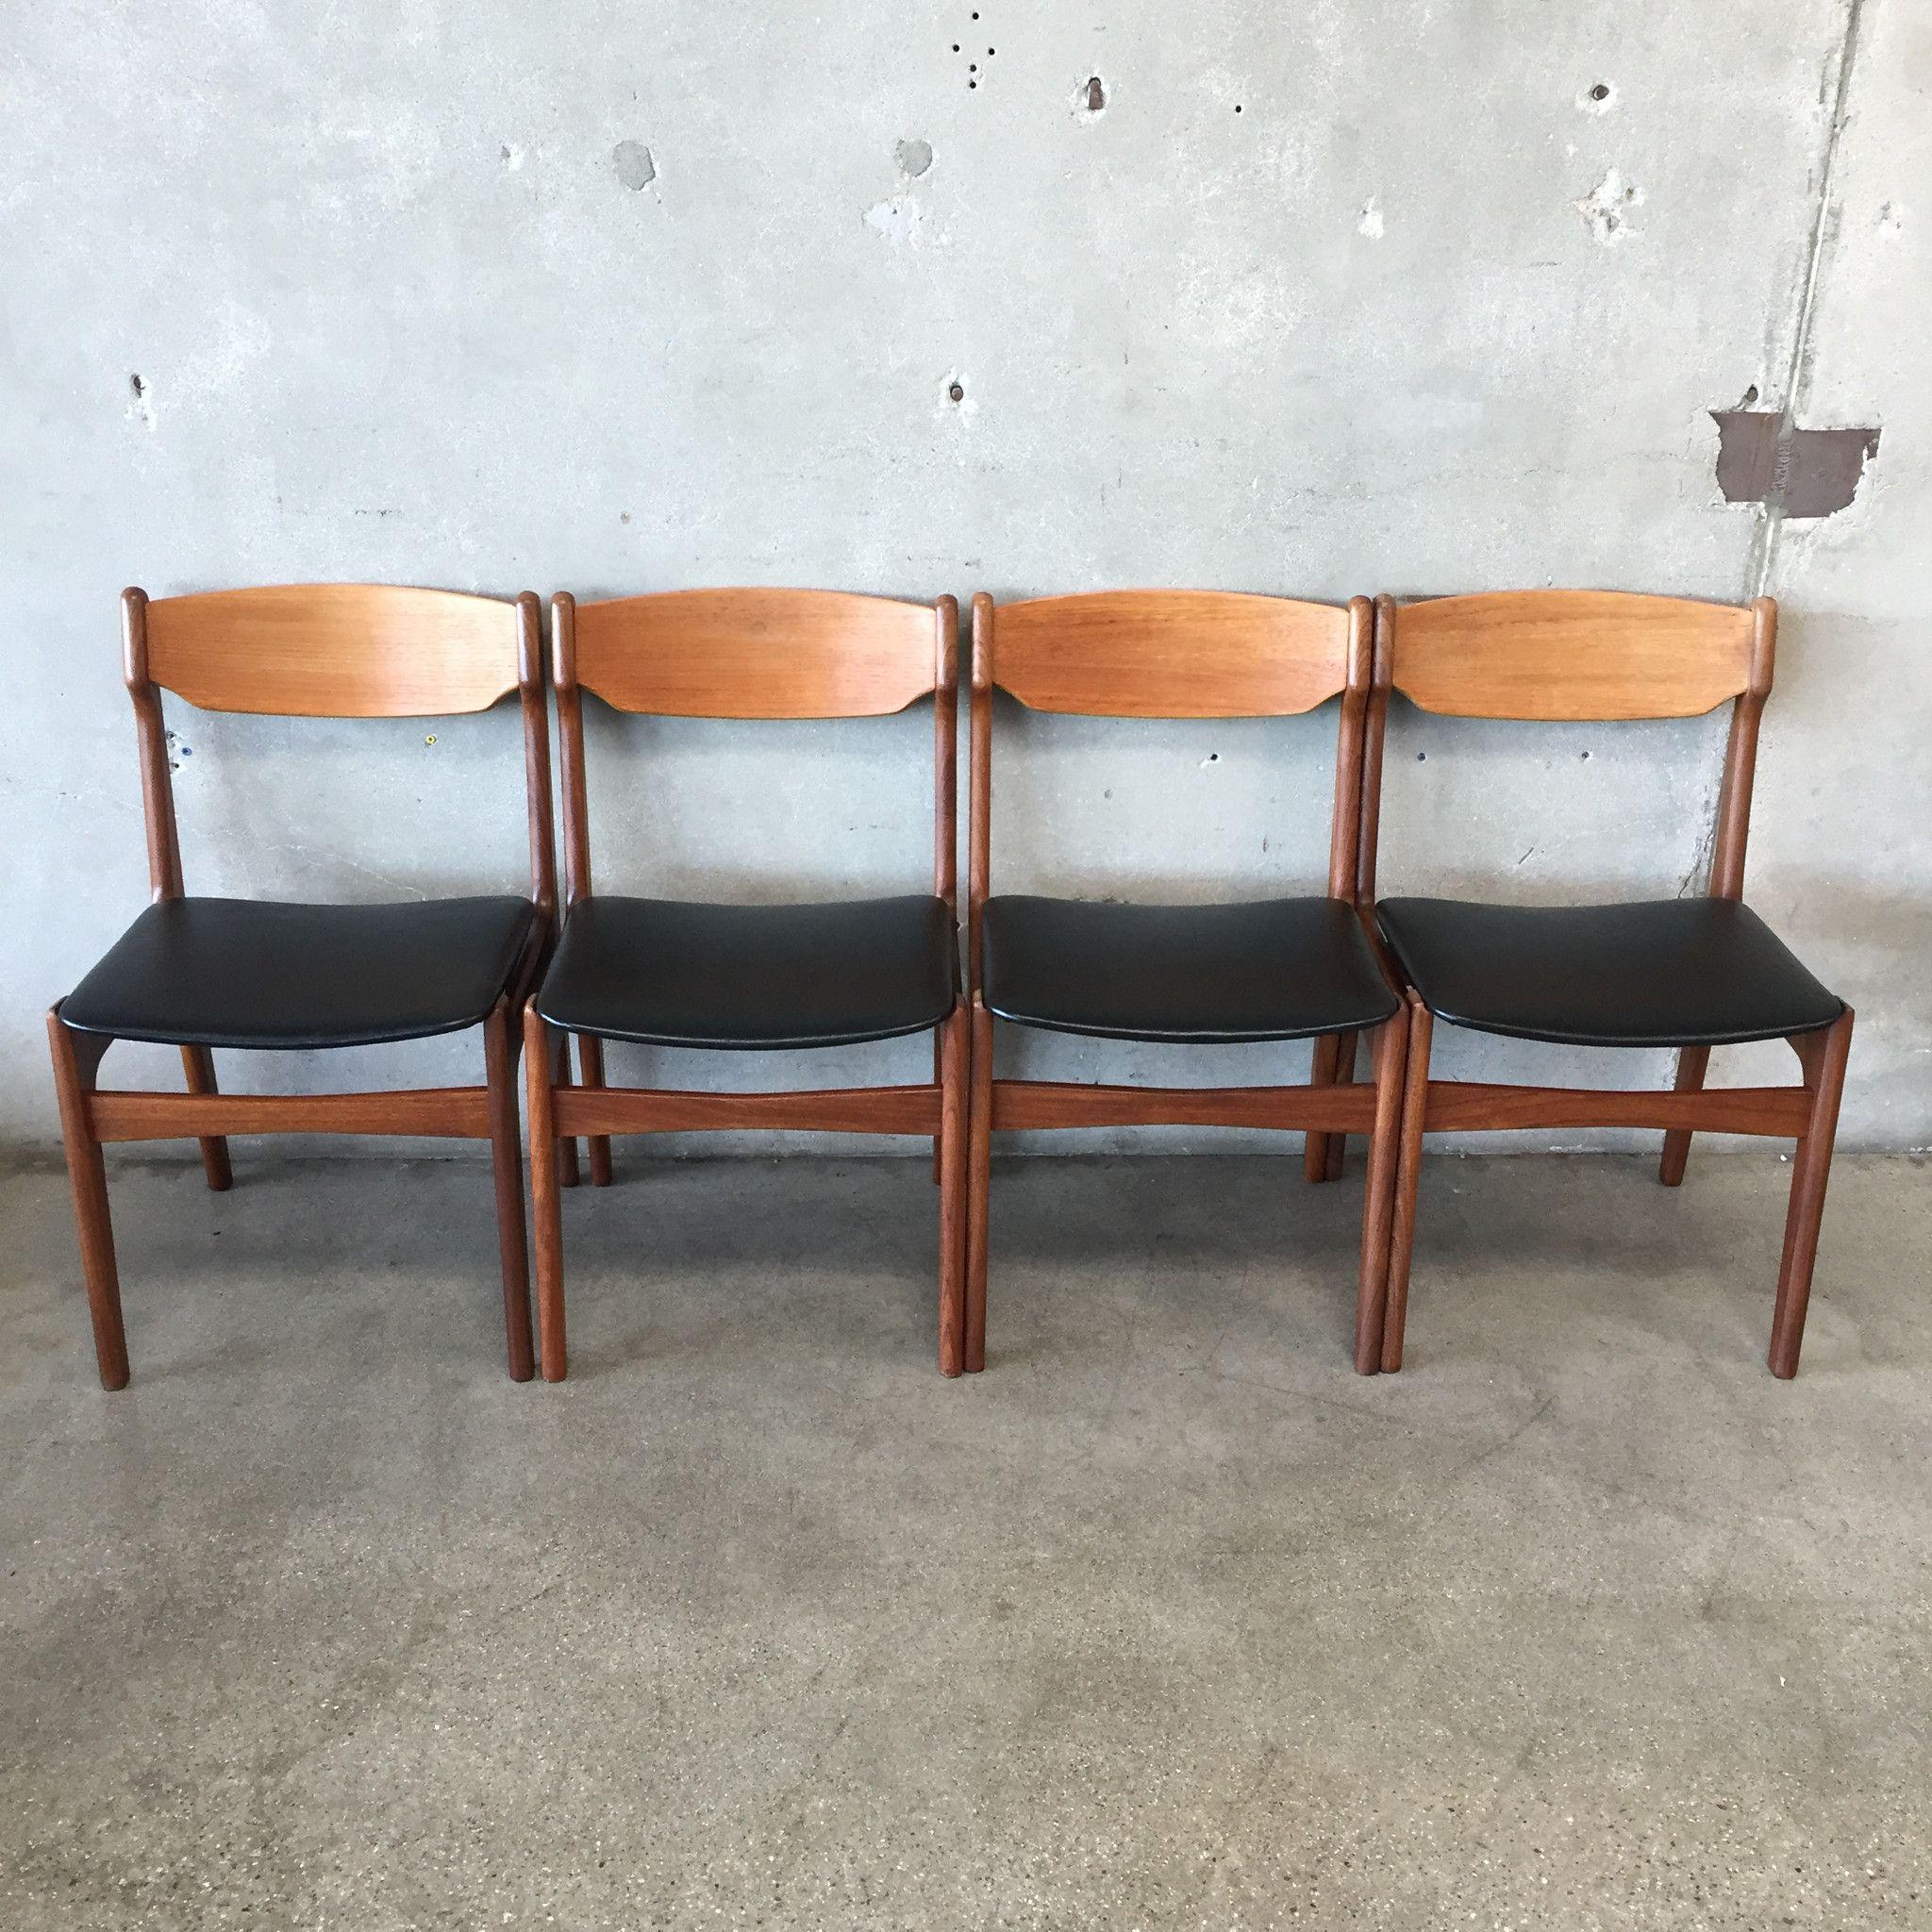 Mid Century Modern Teak Dining Chairs Teak Dining Chairs Dining Chairs Chair